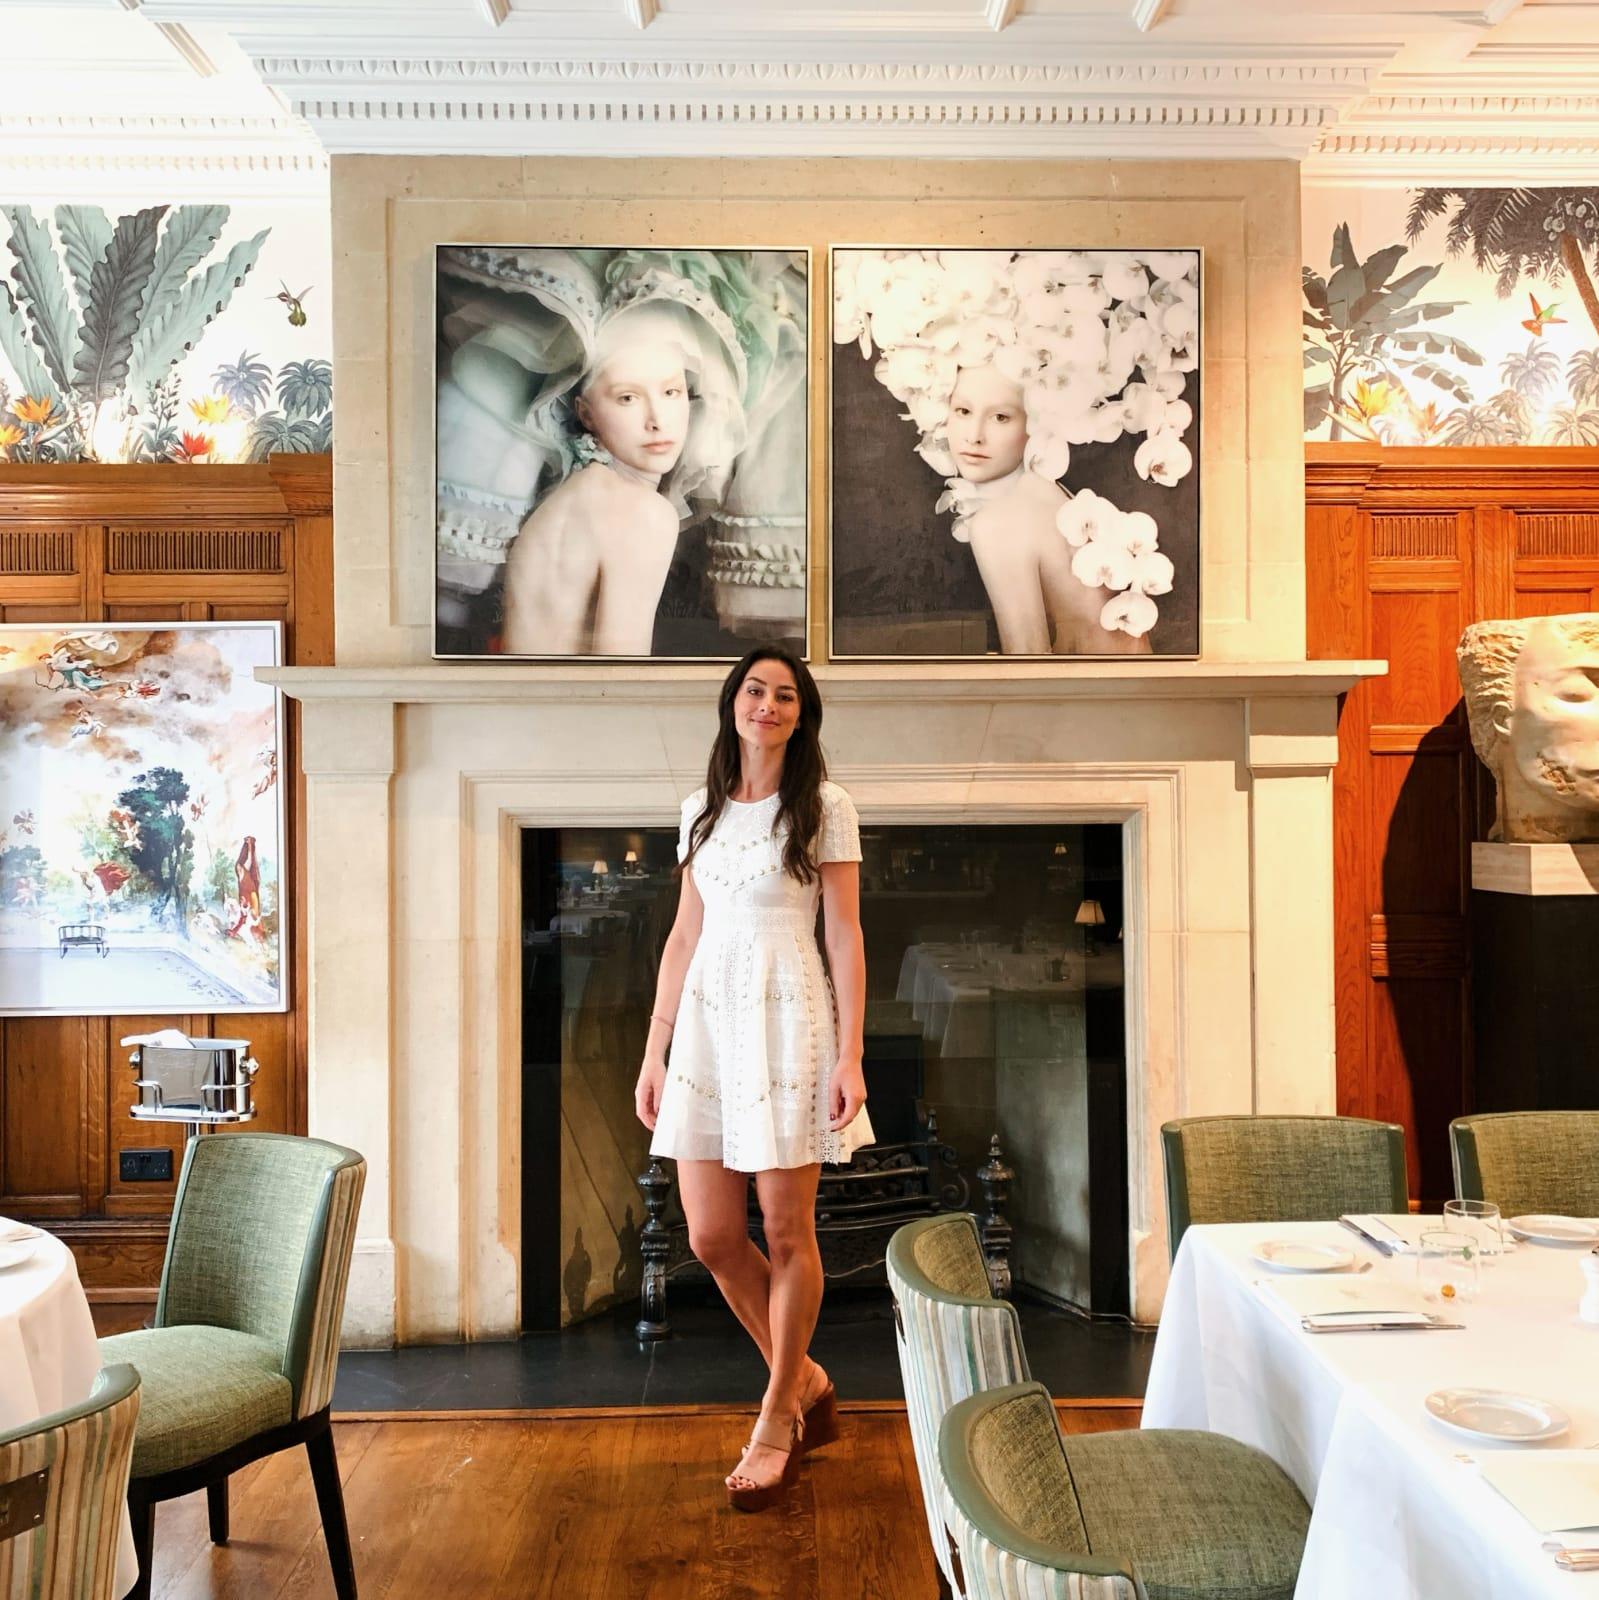 Artworks Isabelle van Zeijl on display at Brown's Hotel